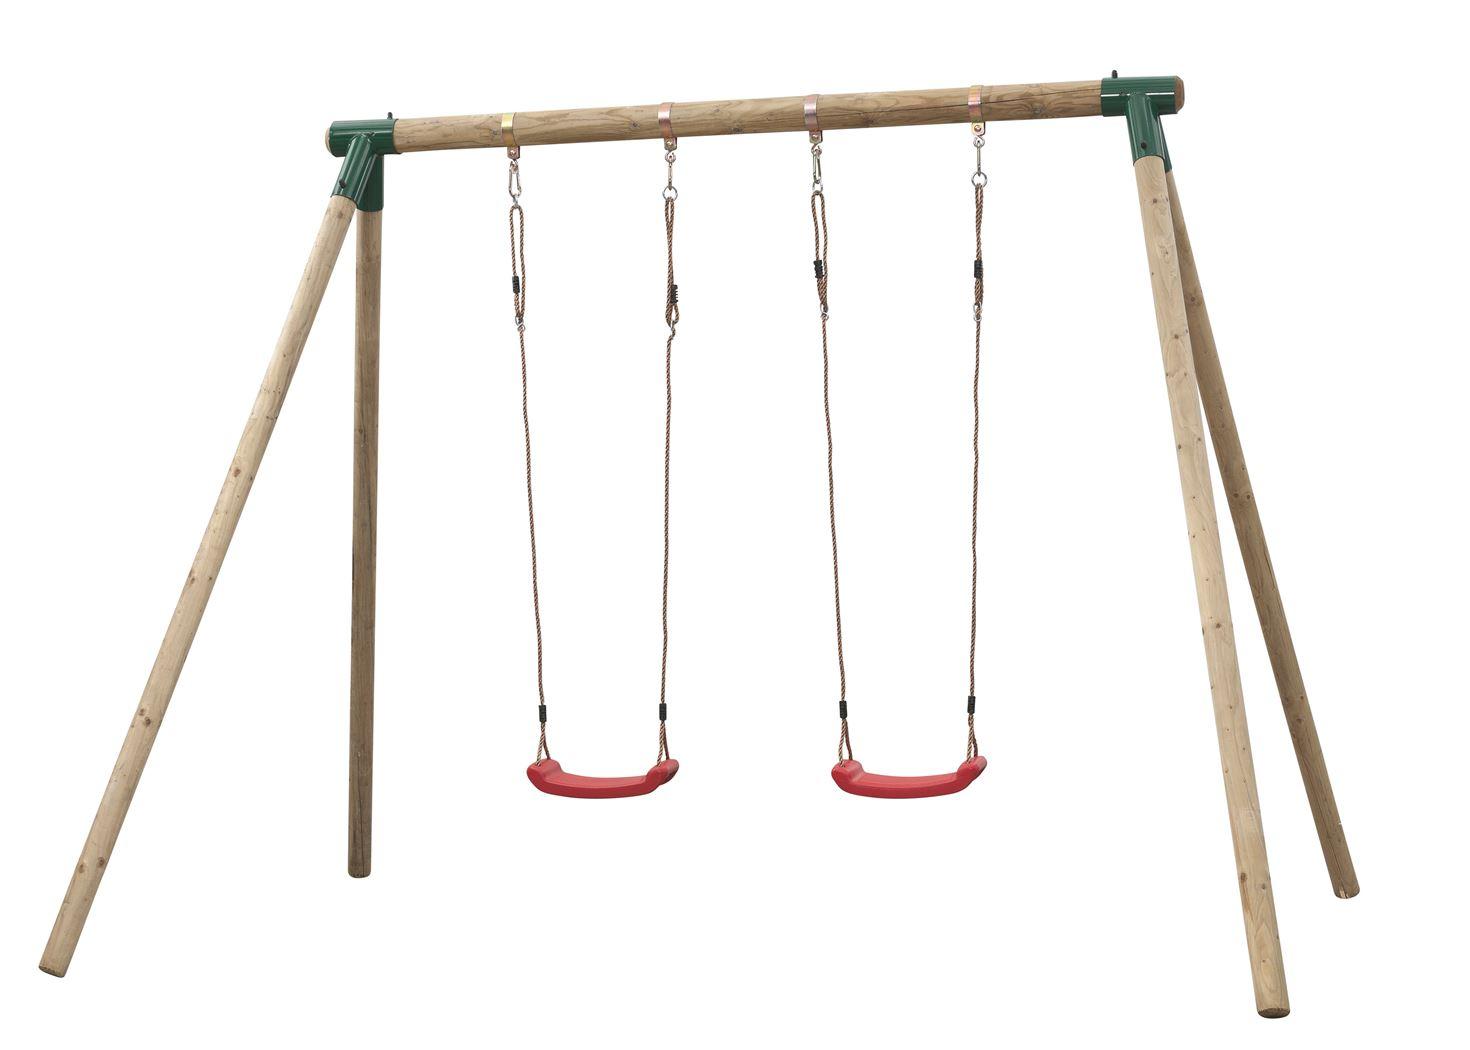 schommel cloe (incl. 2 enkele schommels)